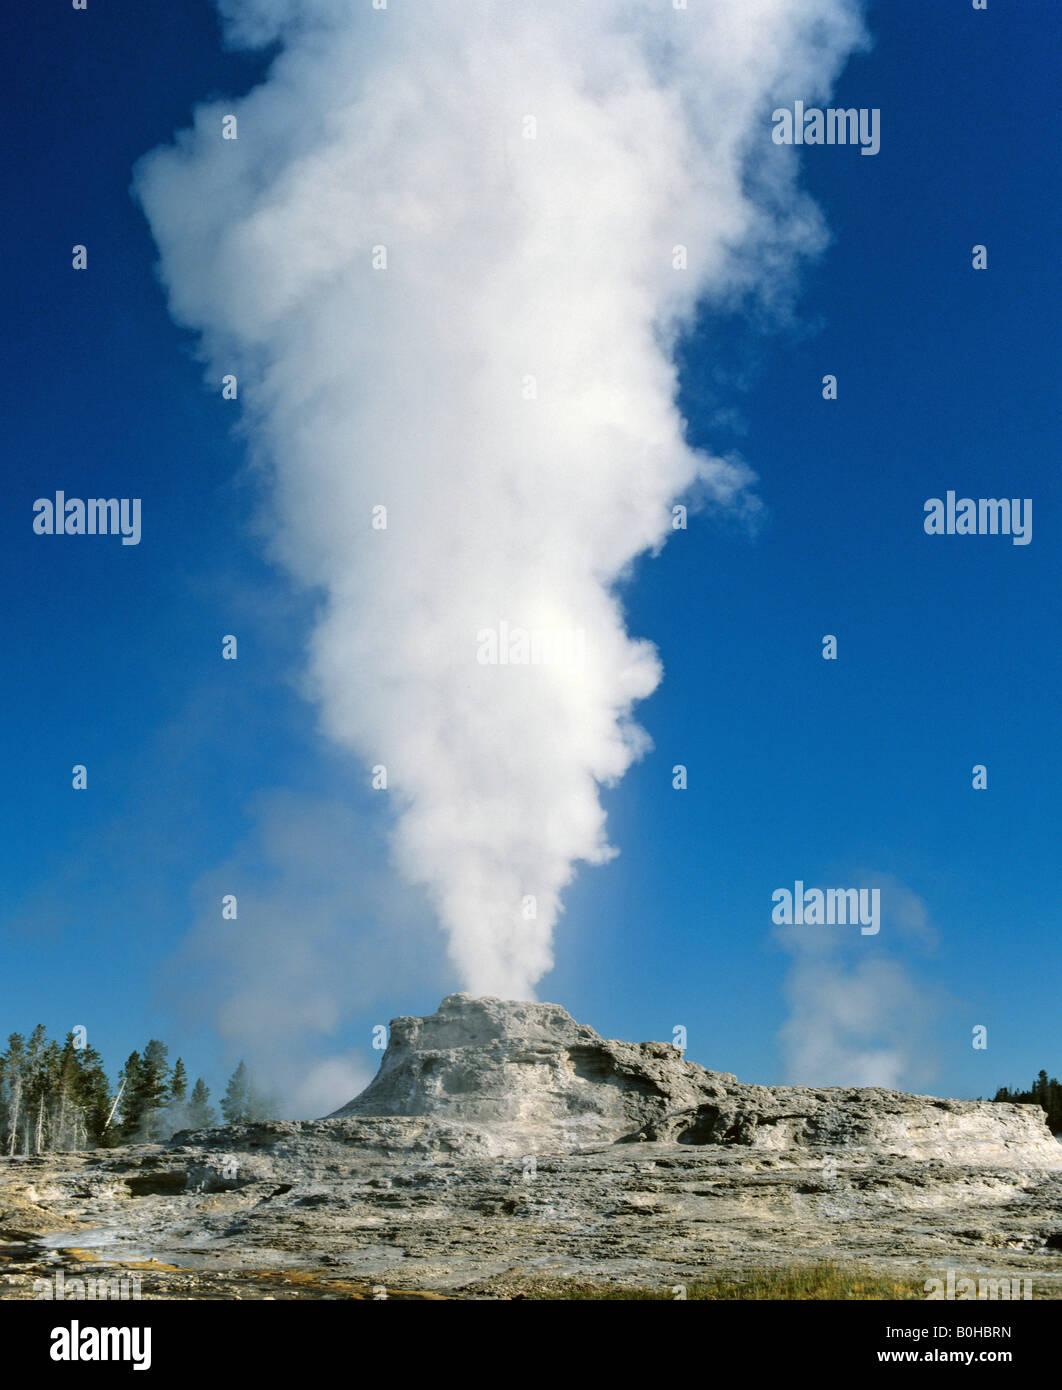 Dampf steigt von Castle-Geysir, Yellowstone-Nationalpark, Rocky Mountains, Wyoming, USA Stockbild